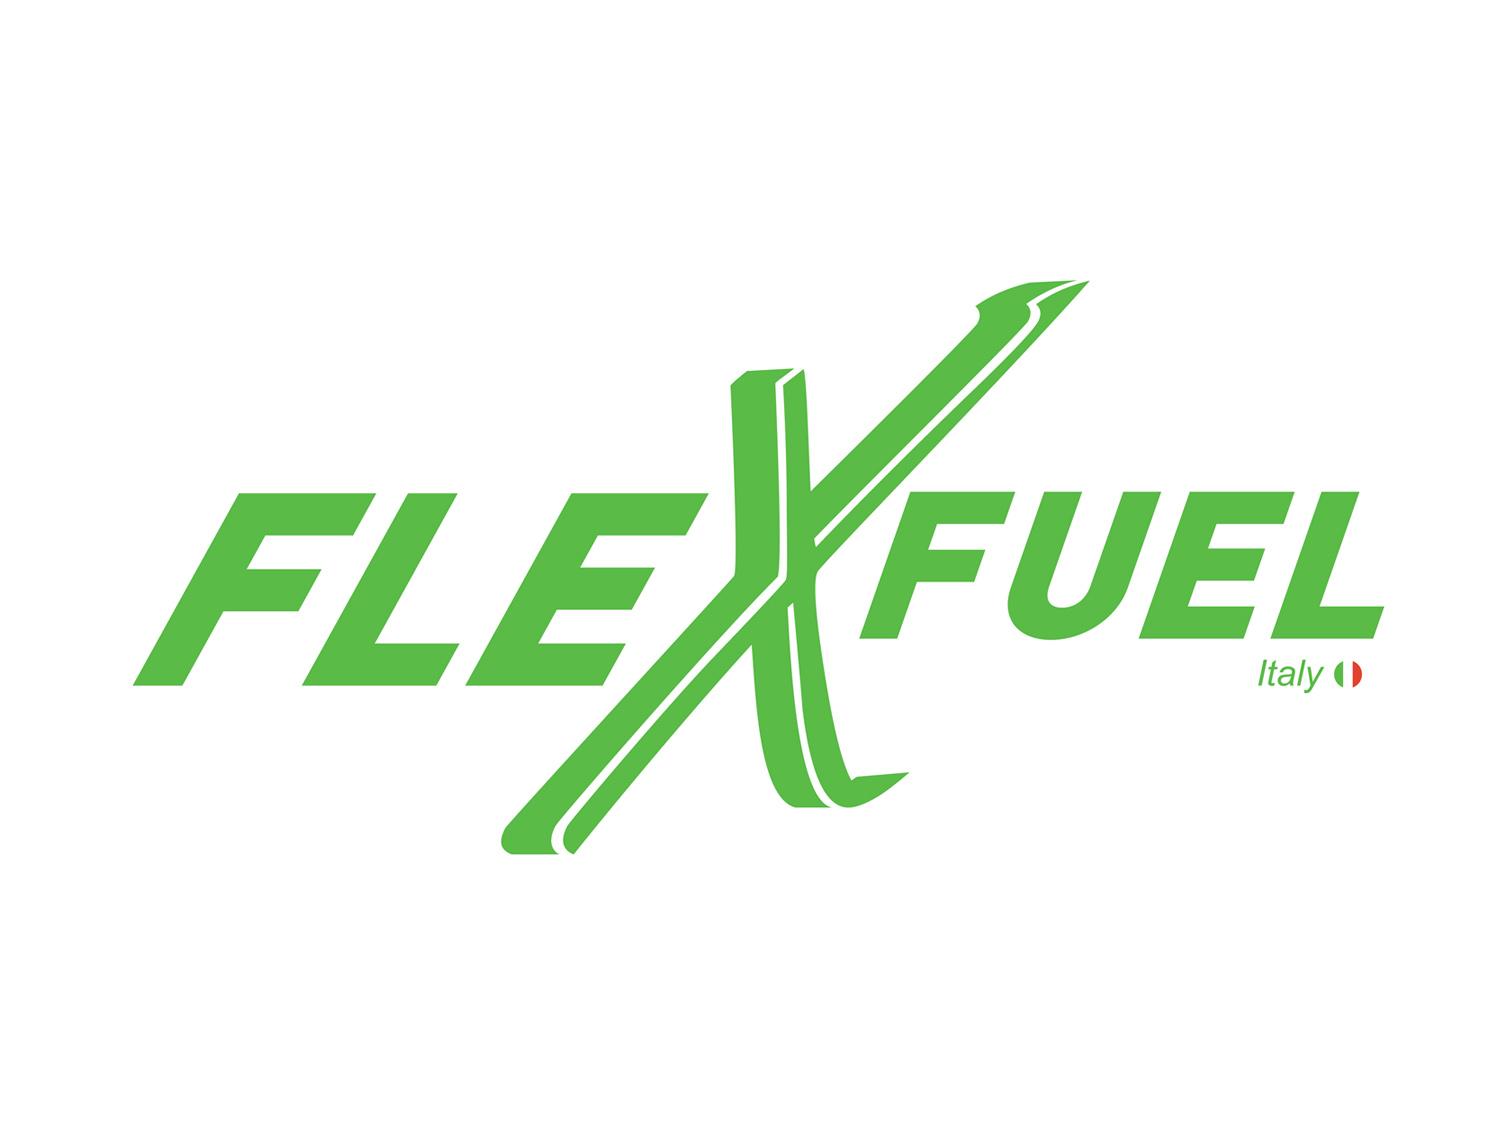 C&M_Clienti_Flexfuel_Logo